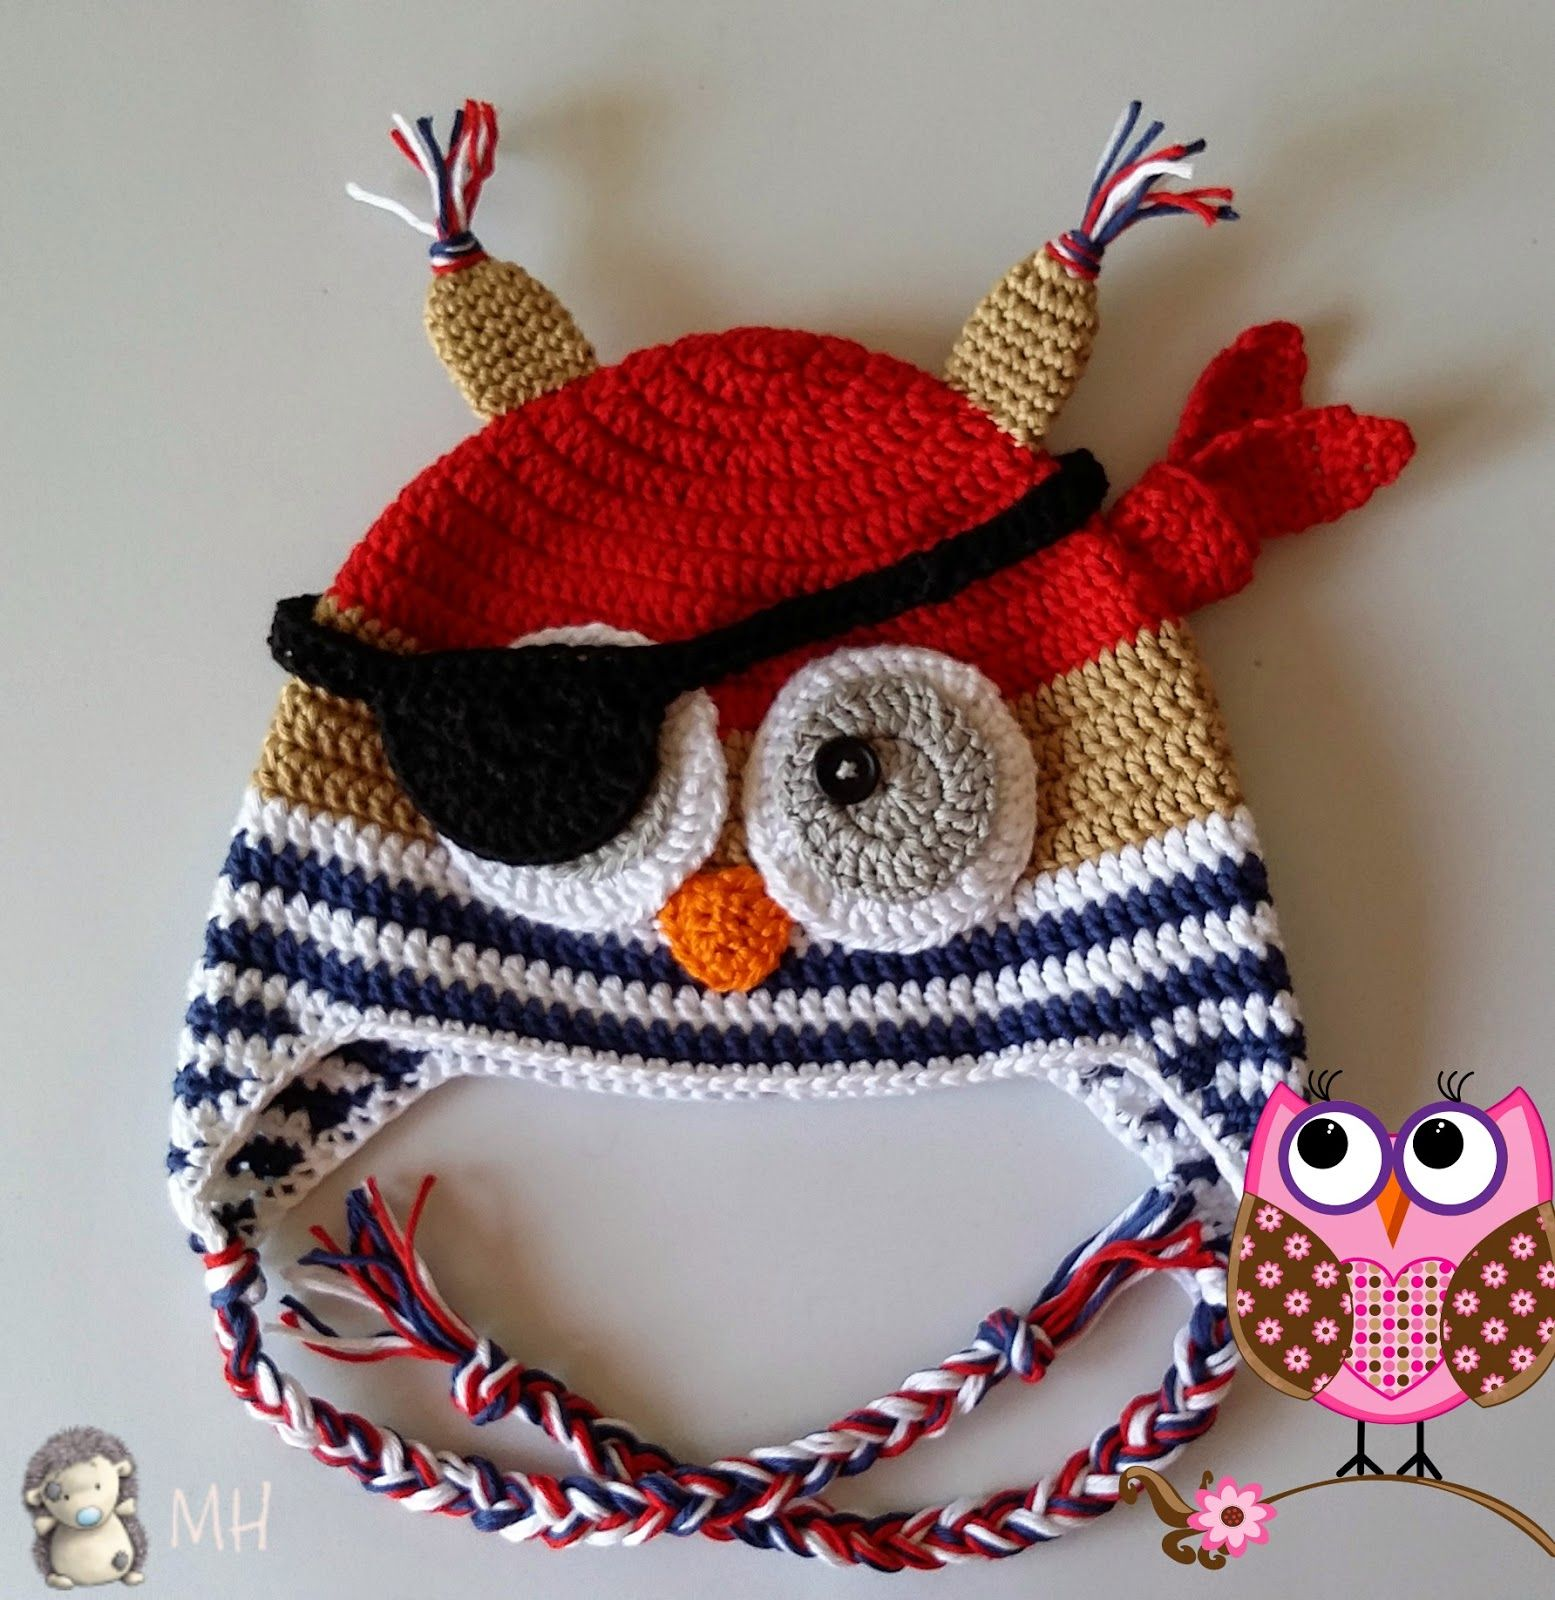 Gorro Búho Pirata A Crochet, Patrón Gratis | crochet gorros y ...